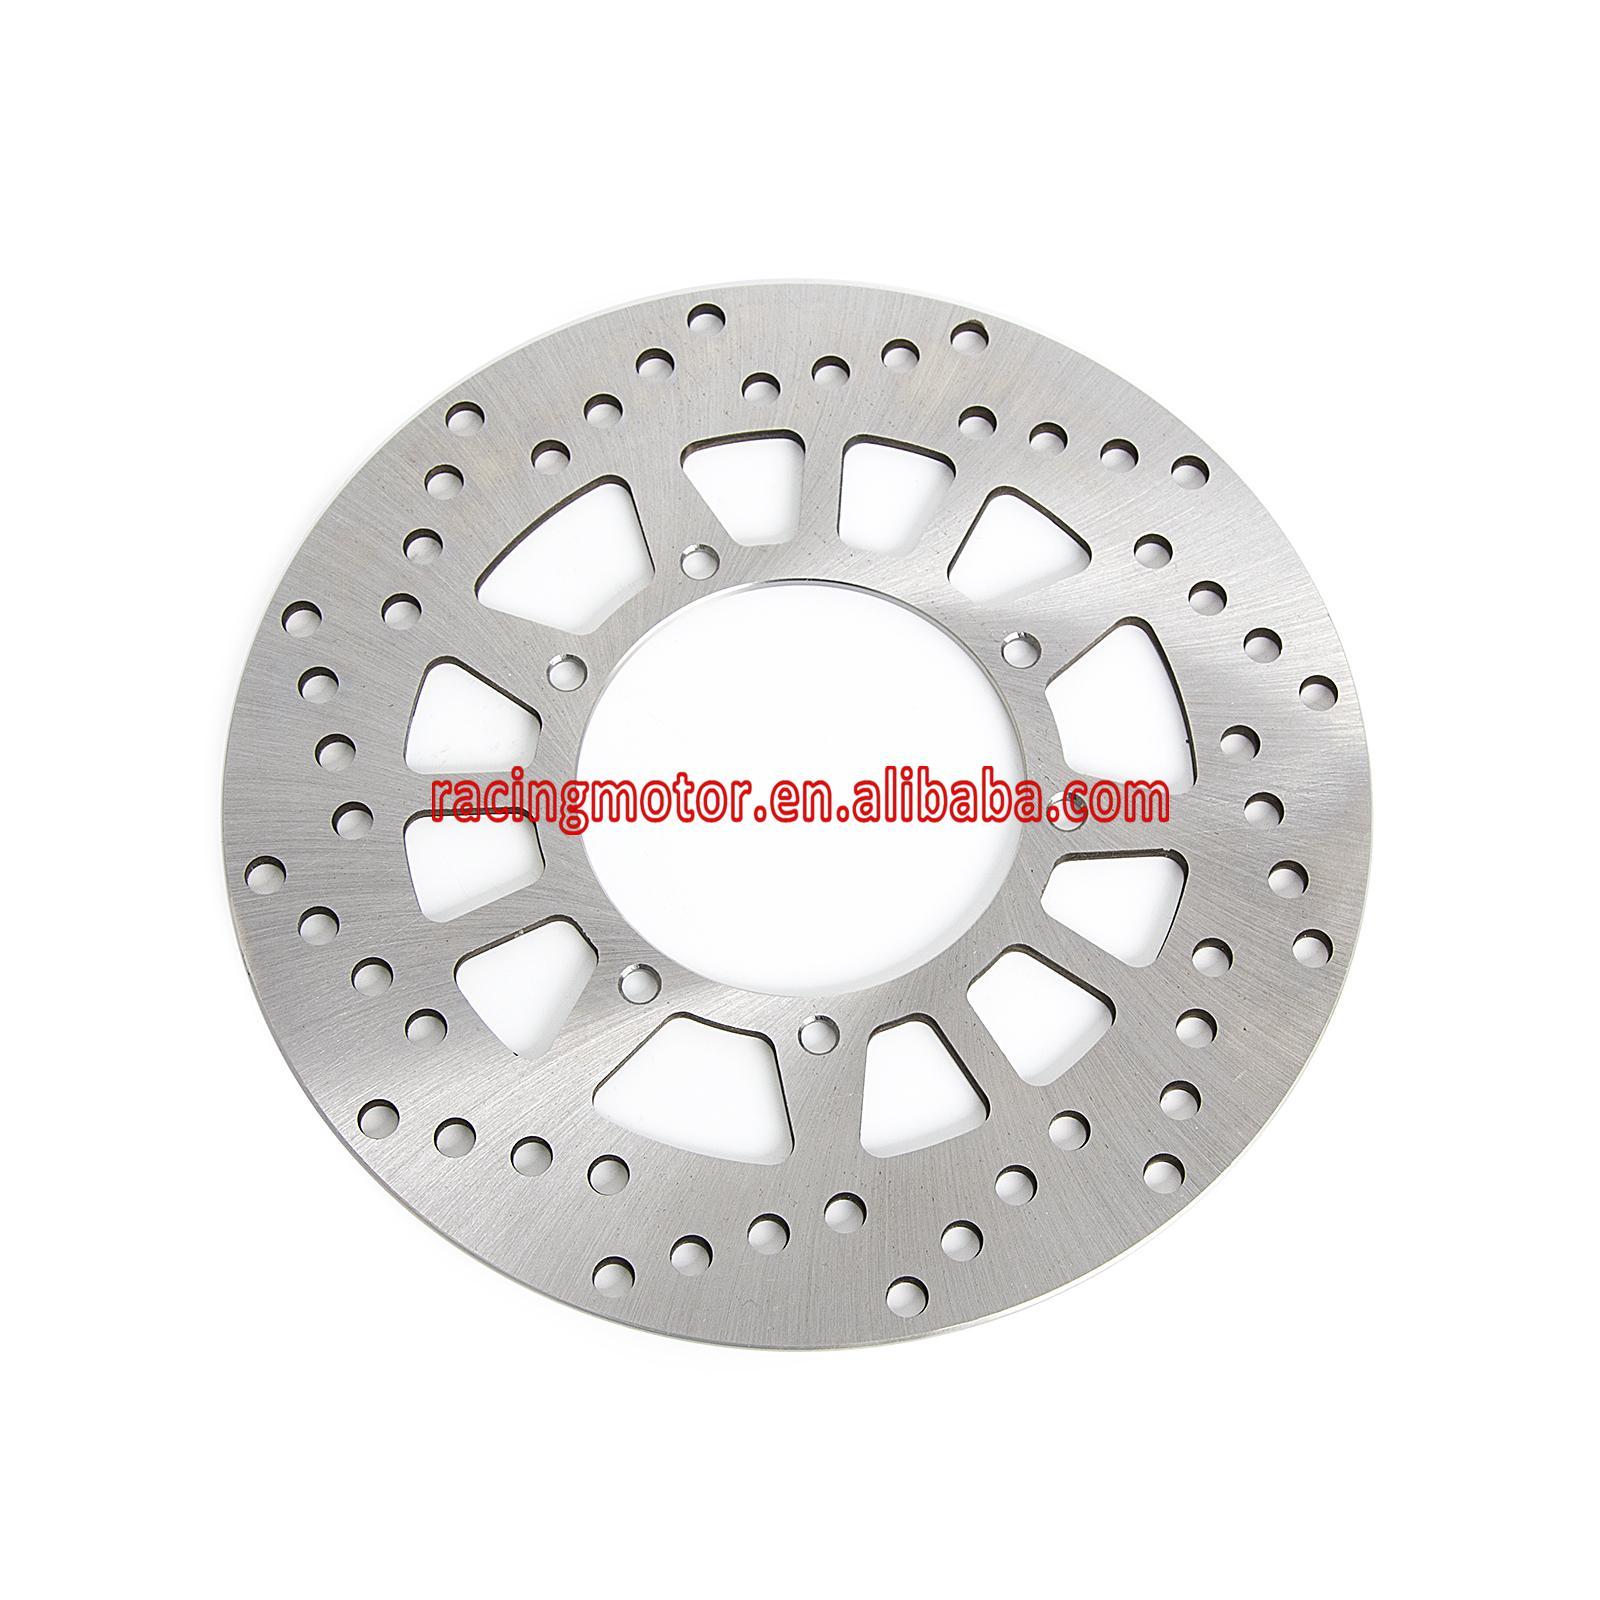 Motorcycle Front Brake Disc Rotor For Yamaha DT125 TW125 DT200 TW200 ST225 TW225 XT225 XT250 XG250 YZ125 YZ250 YZ450<br>